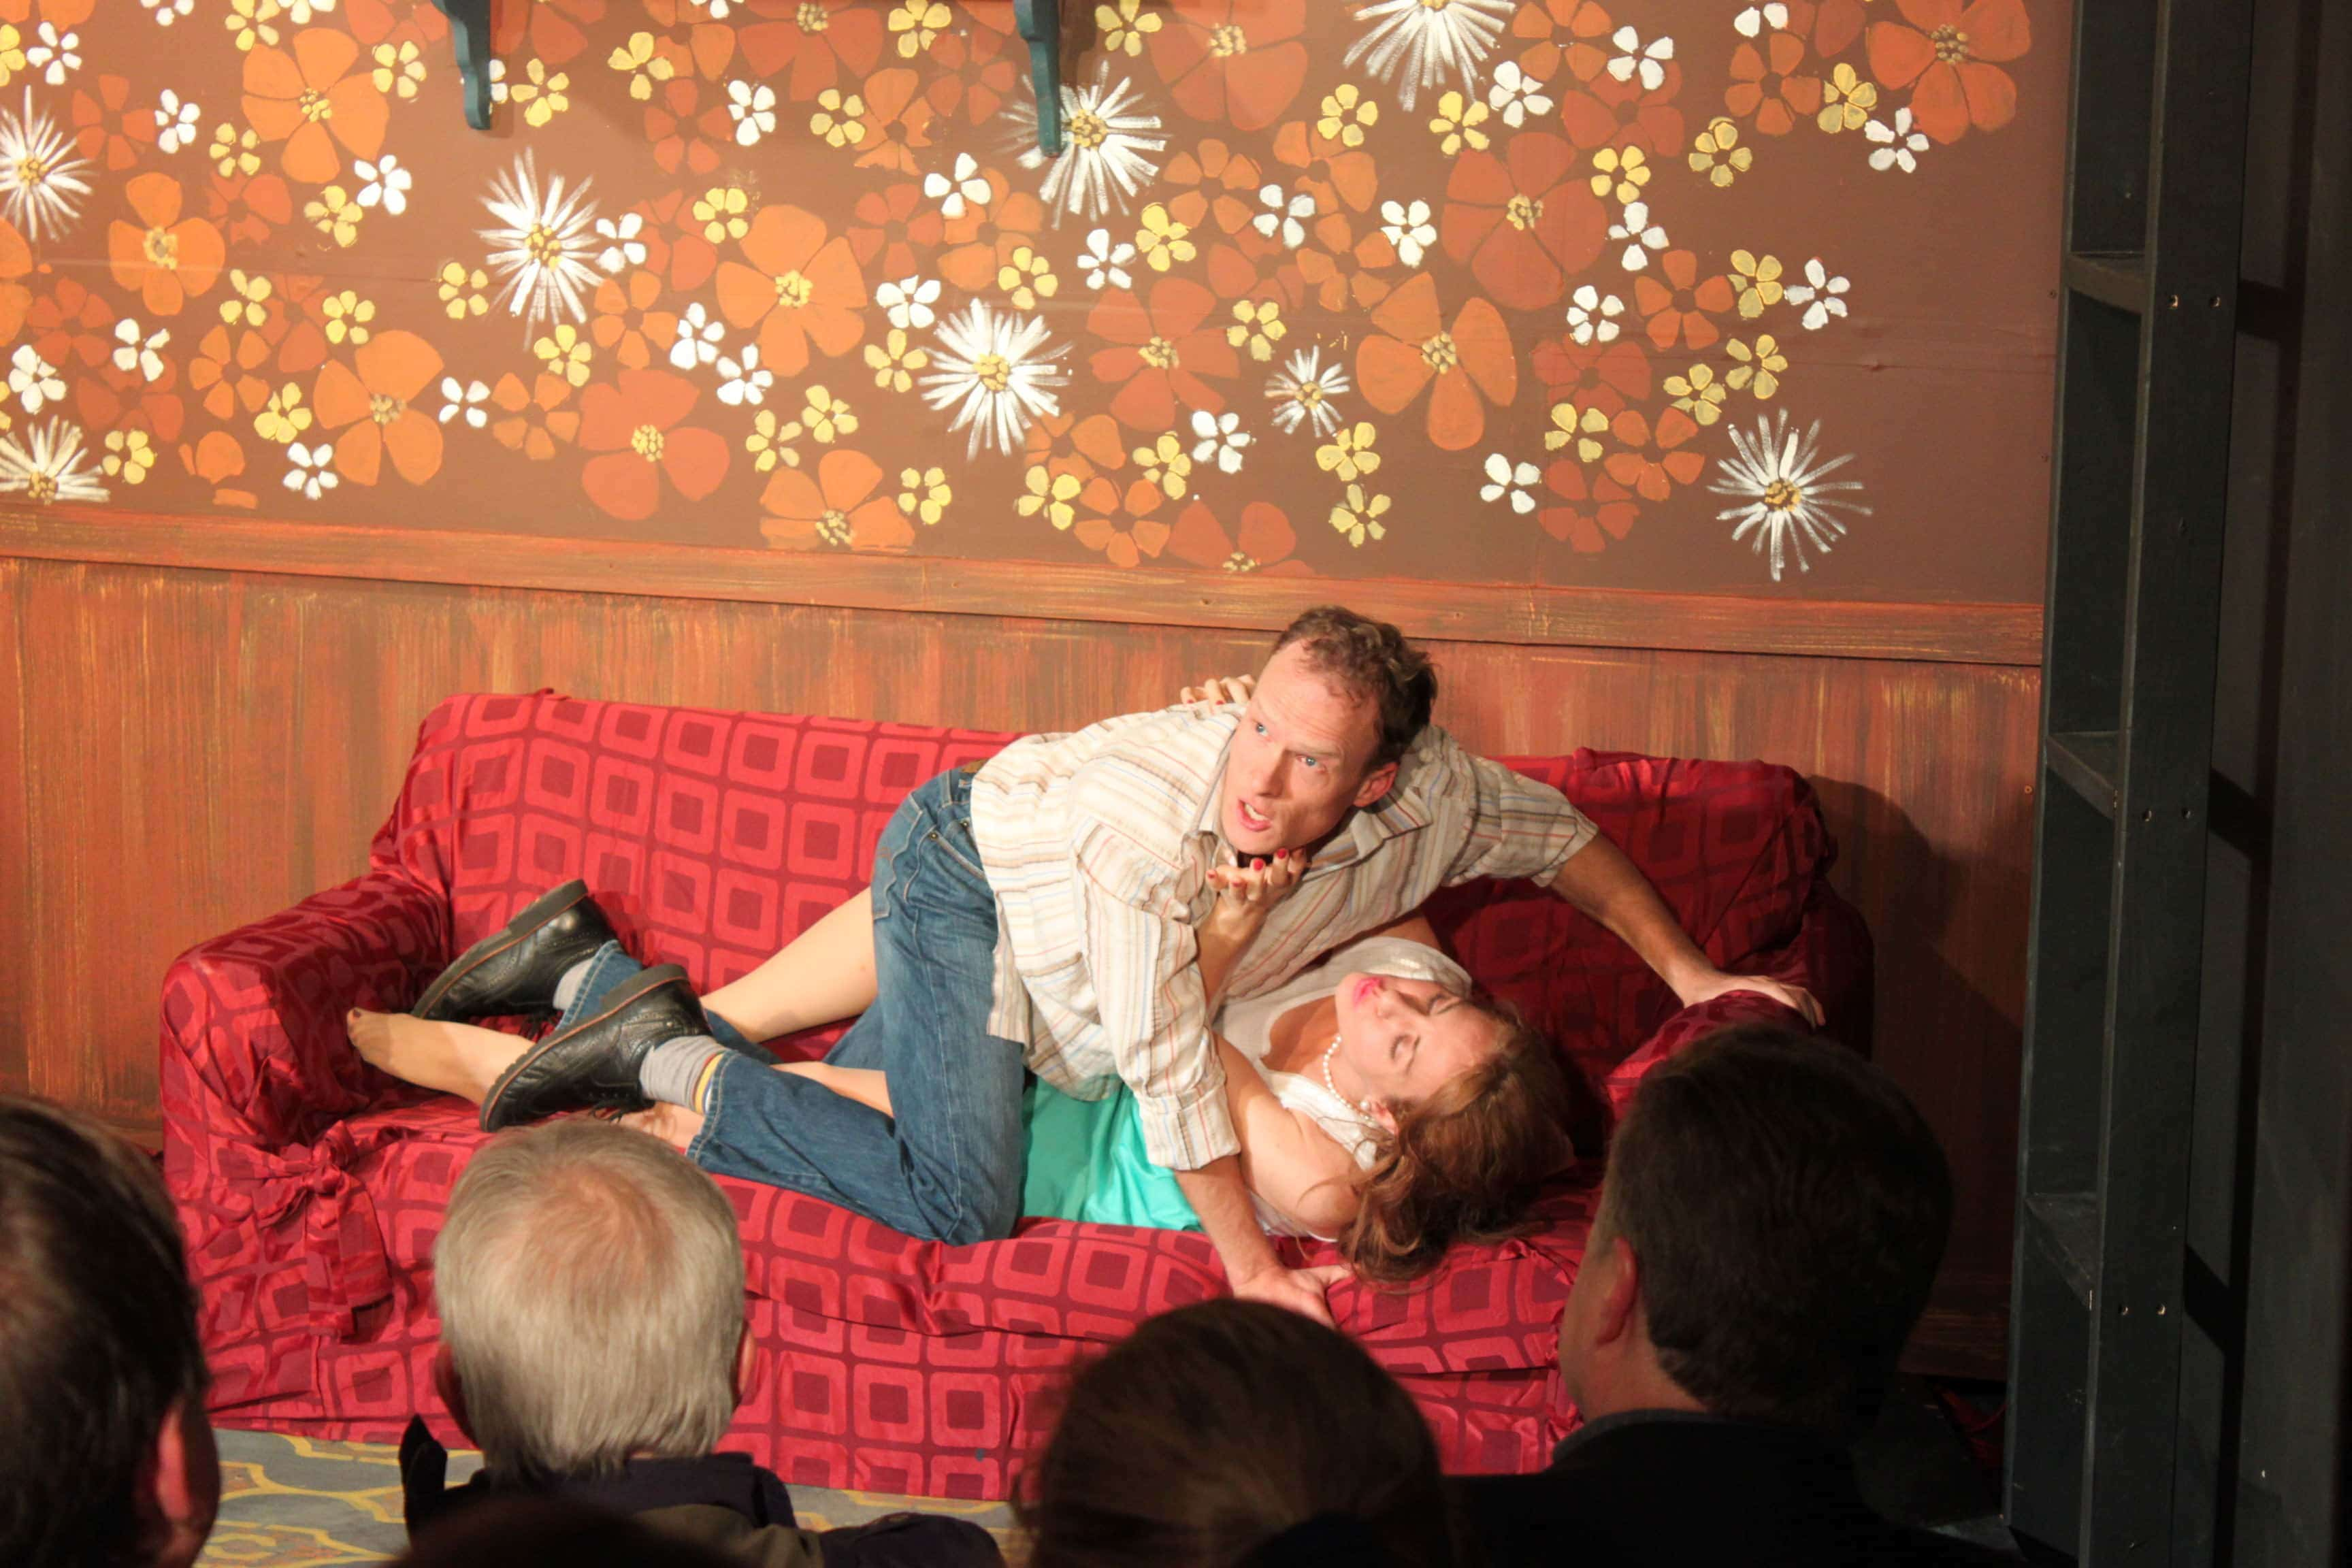 Matt Dundas (Cradeau) and Jennifer Berry (Estelle). Photo by Toly Yarup.